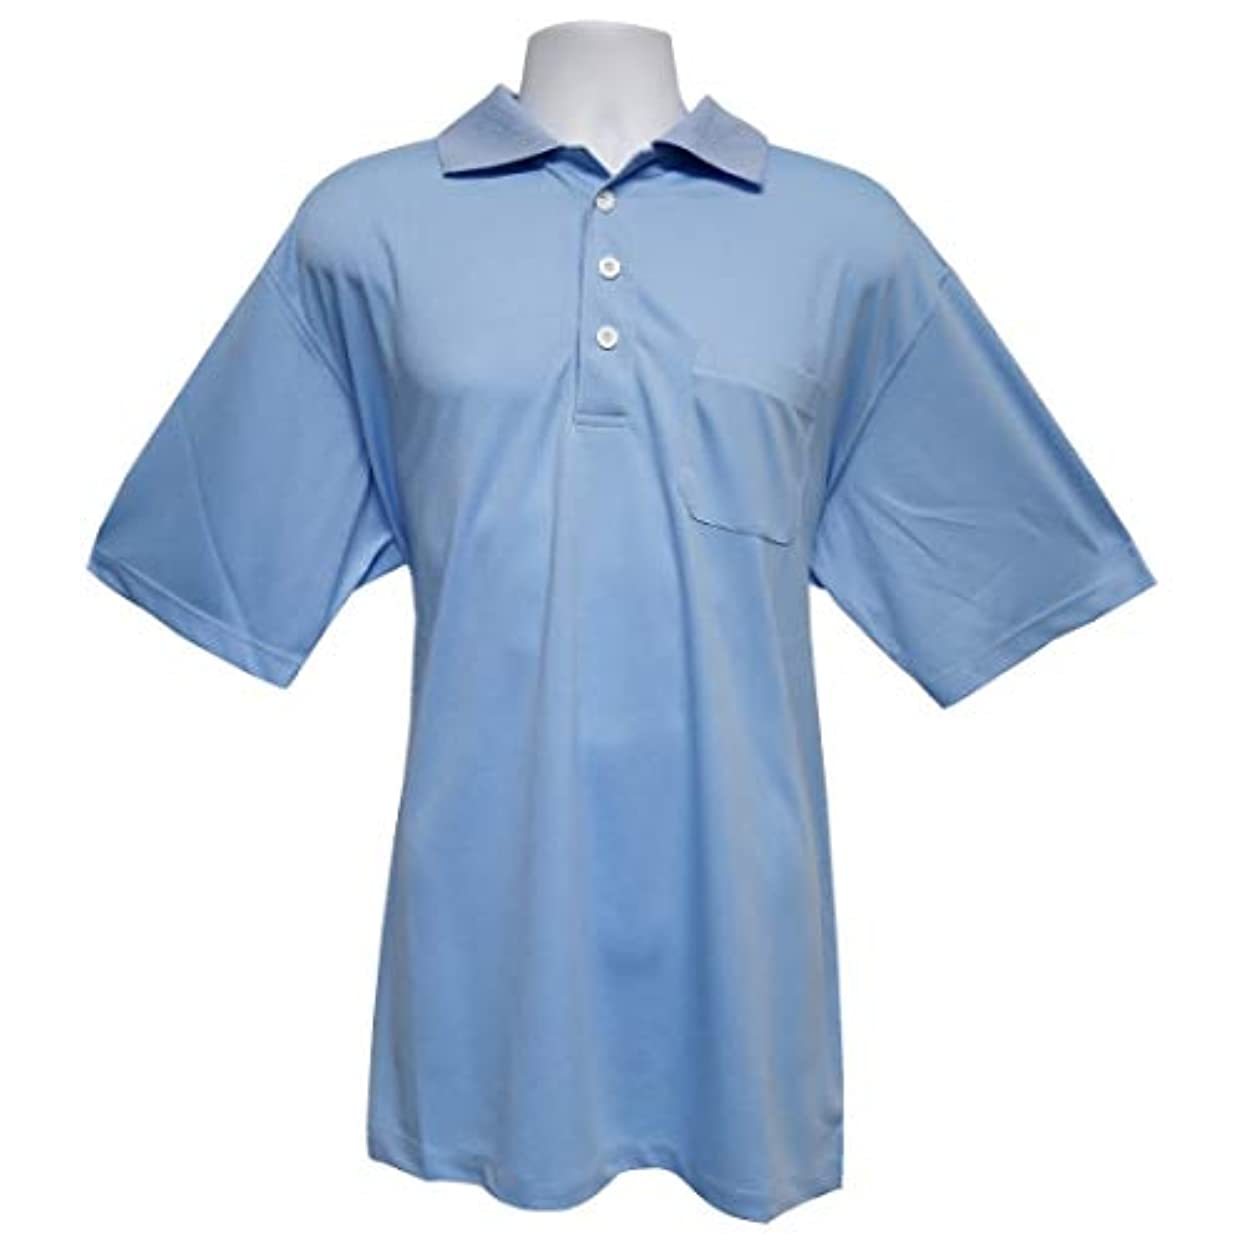 酸化物本土運命伊勢審判本舗 高校野球 審判員用半袖ポロシャツ 1001ISE